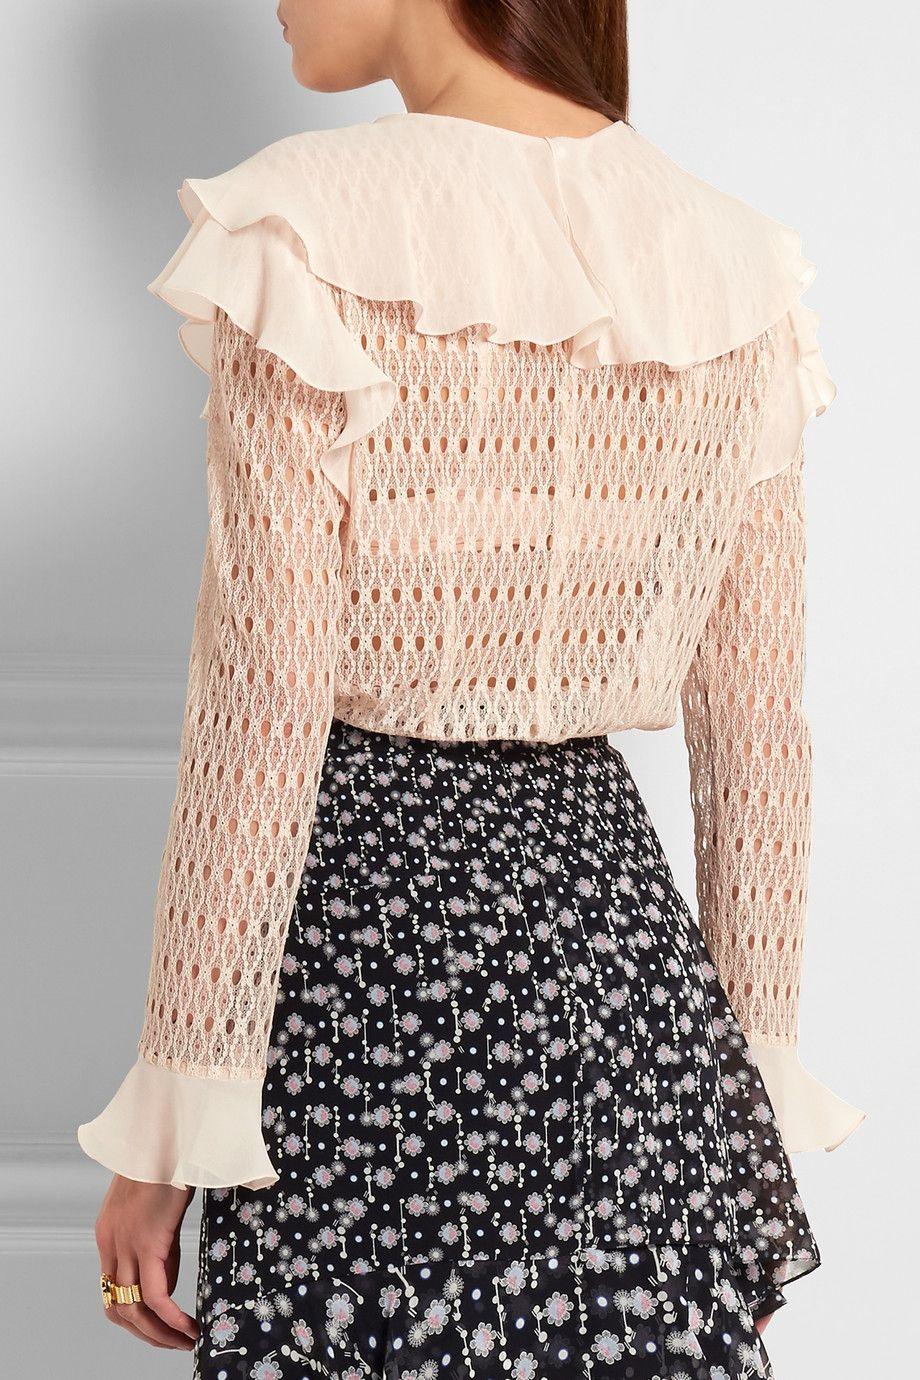 Philosophy di Lorenzo Serafini | Ruffled silk chiffon-trimmed lace blouse |  NET-A